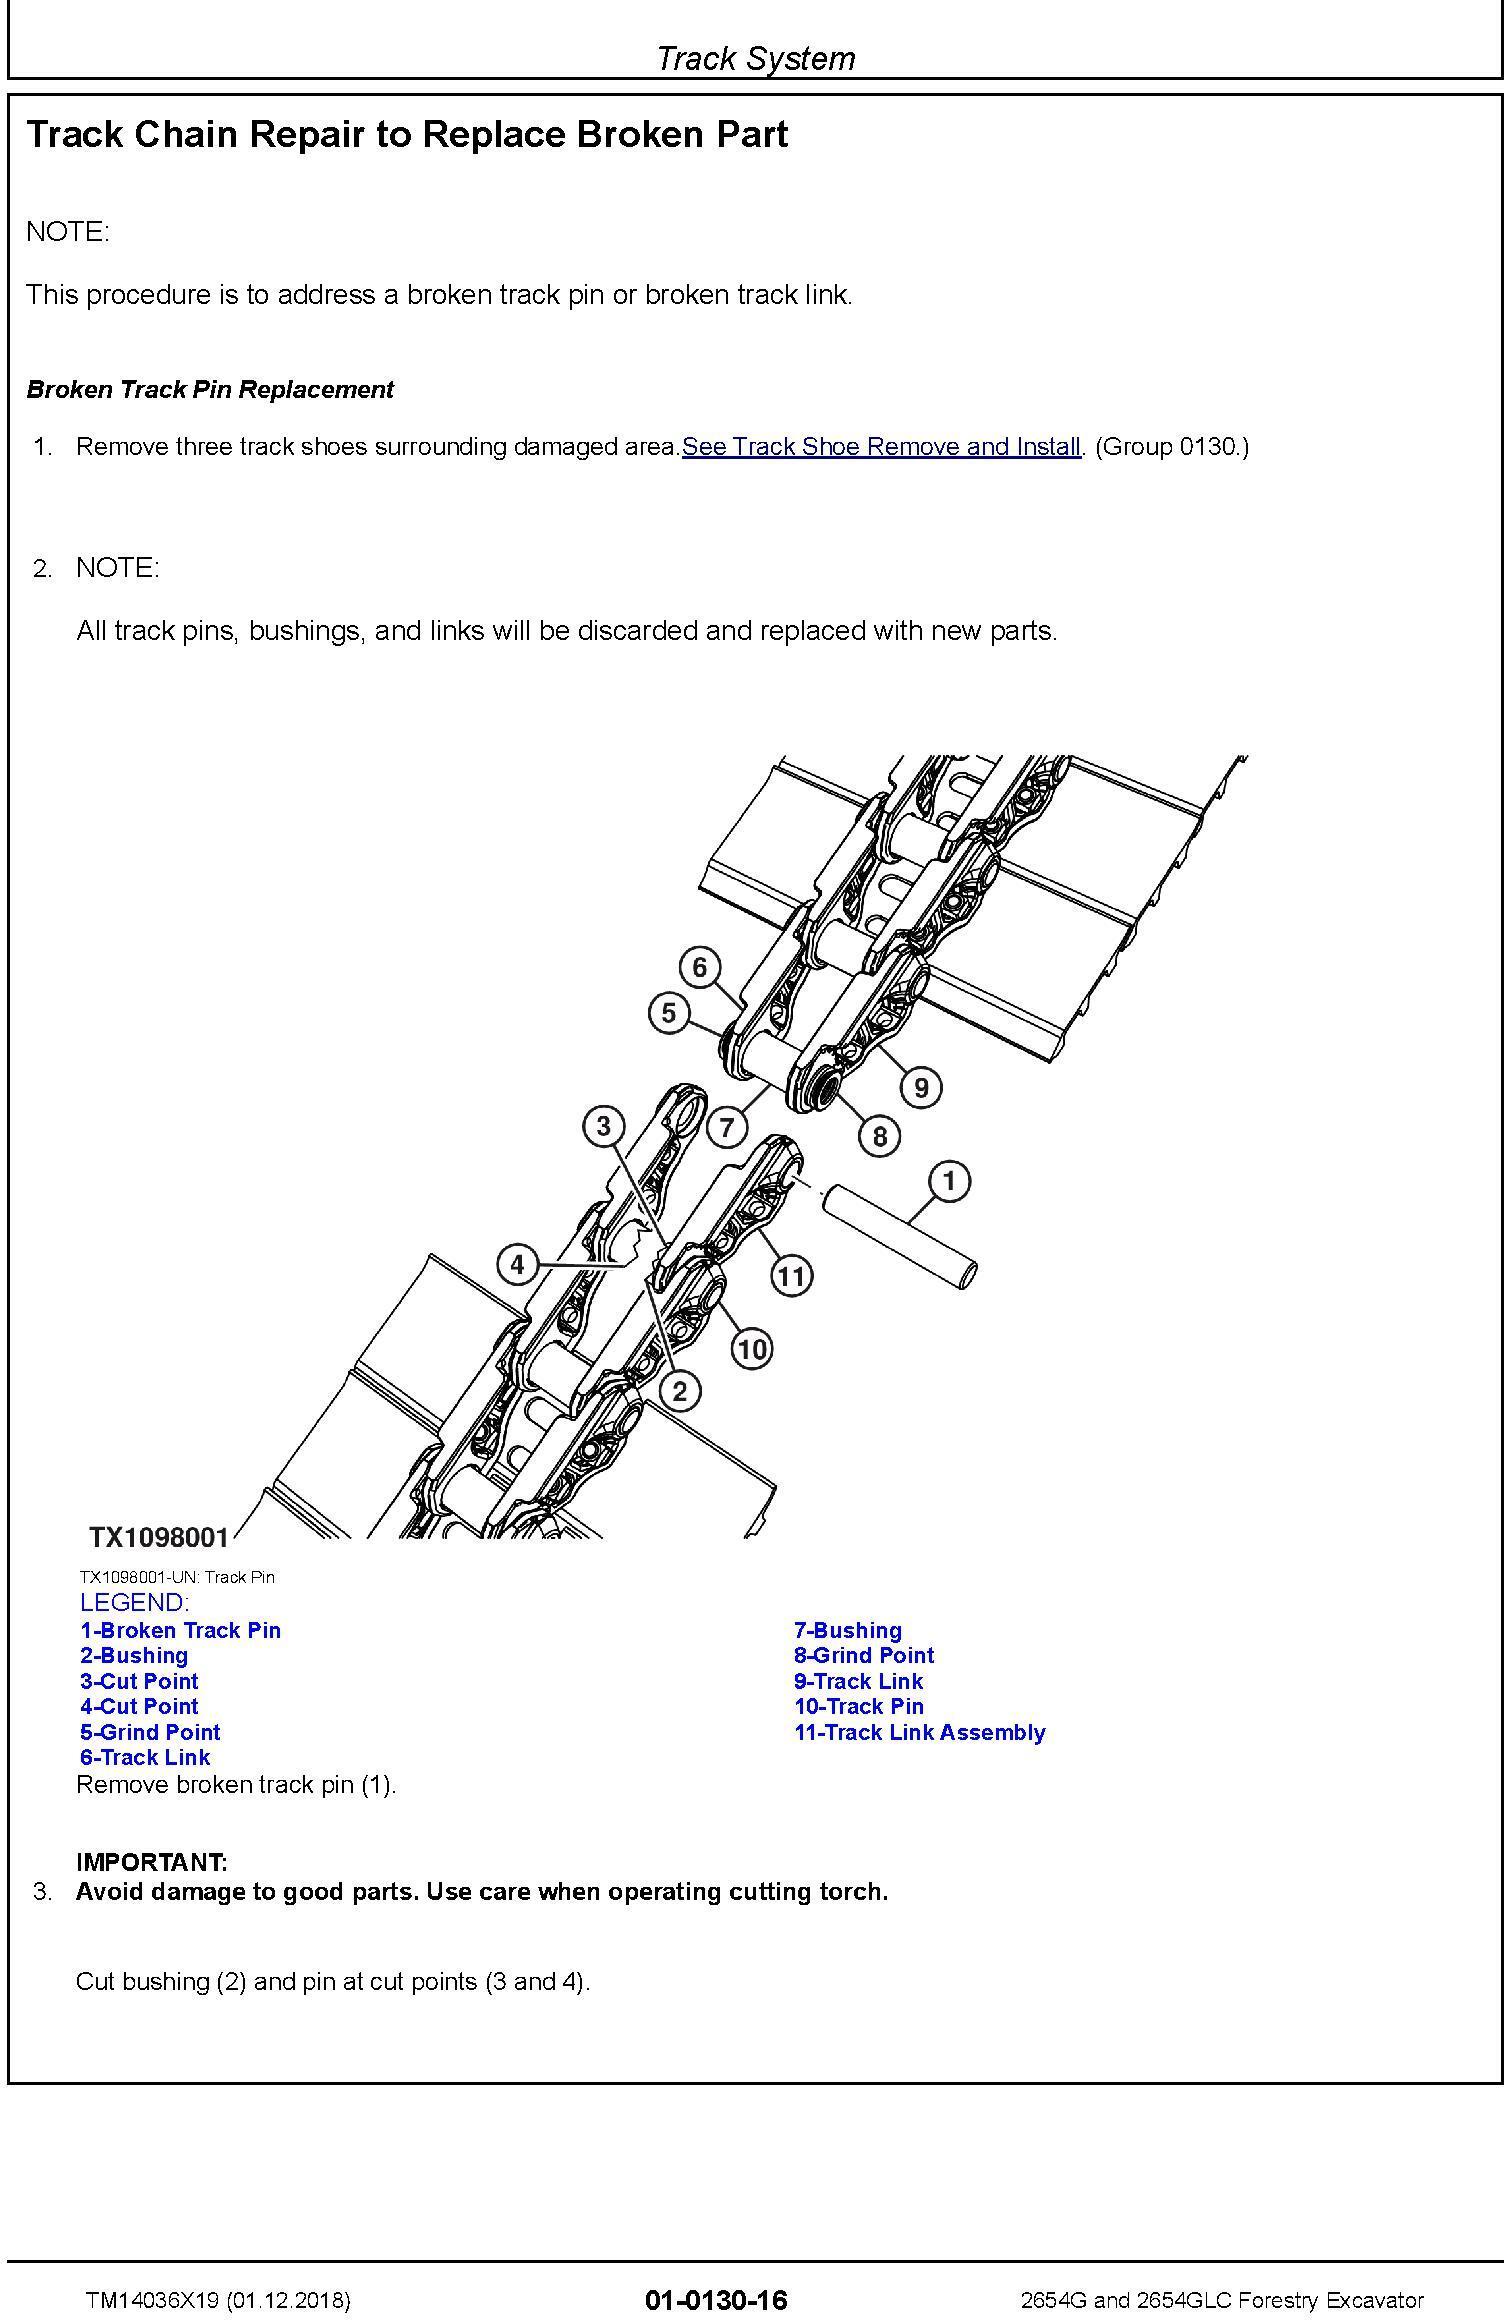 John Deere 2654G,2654GLC (SN.C260001-,D260001) Forestry Excavator Repair Service Manual (TM14036X19) - 1